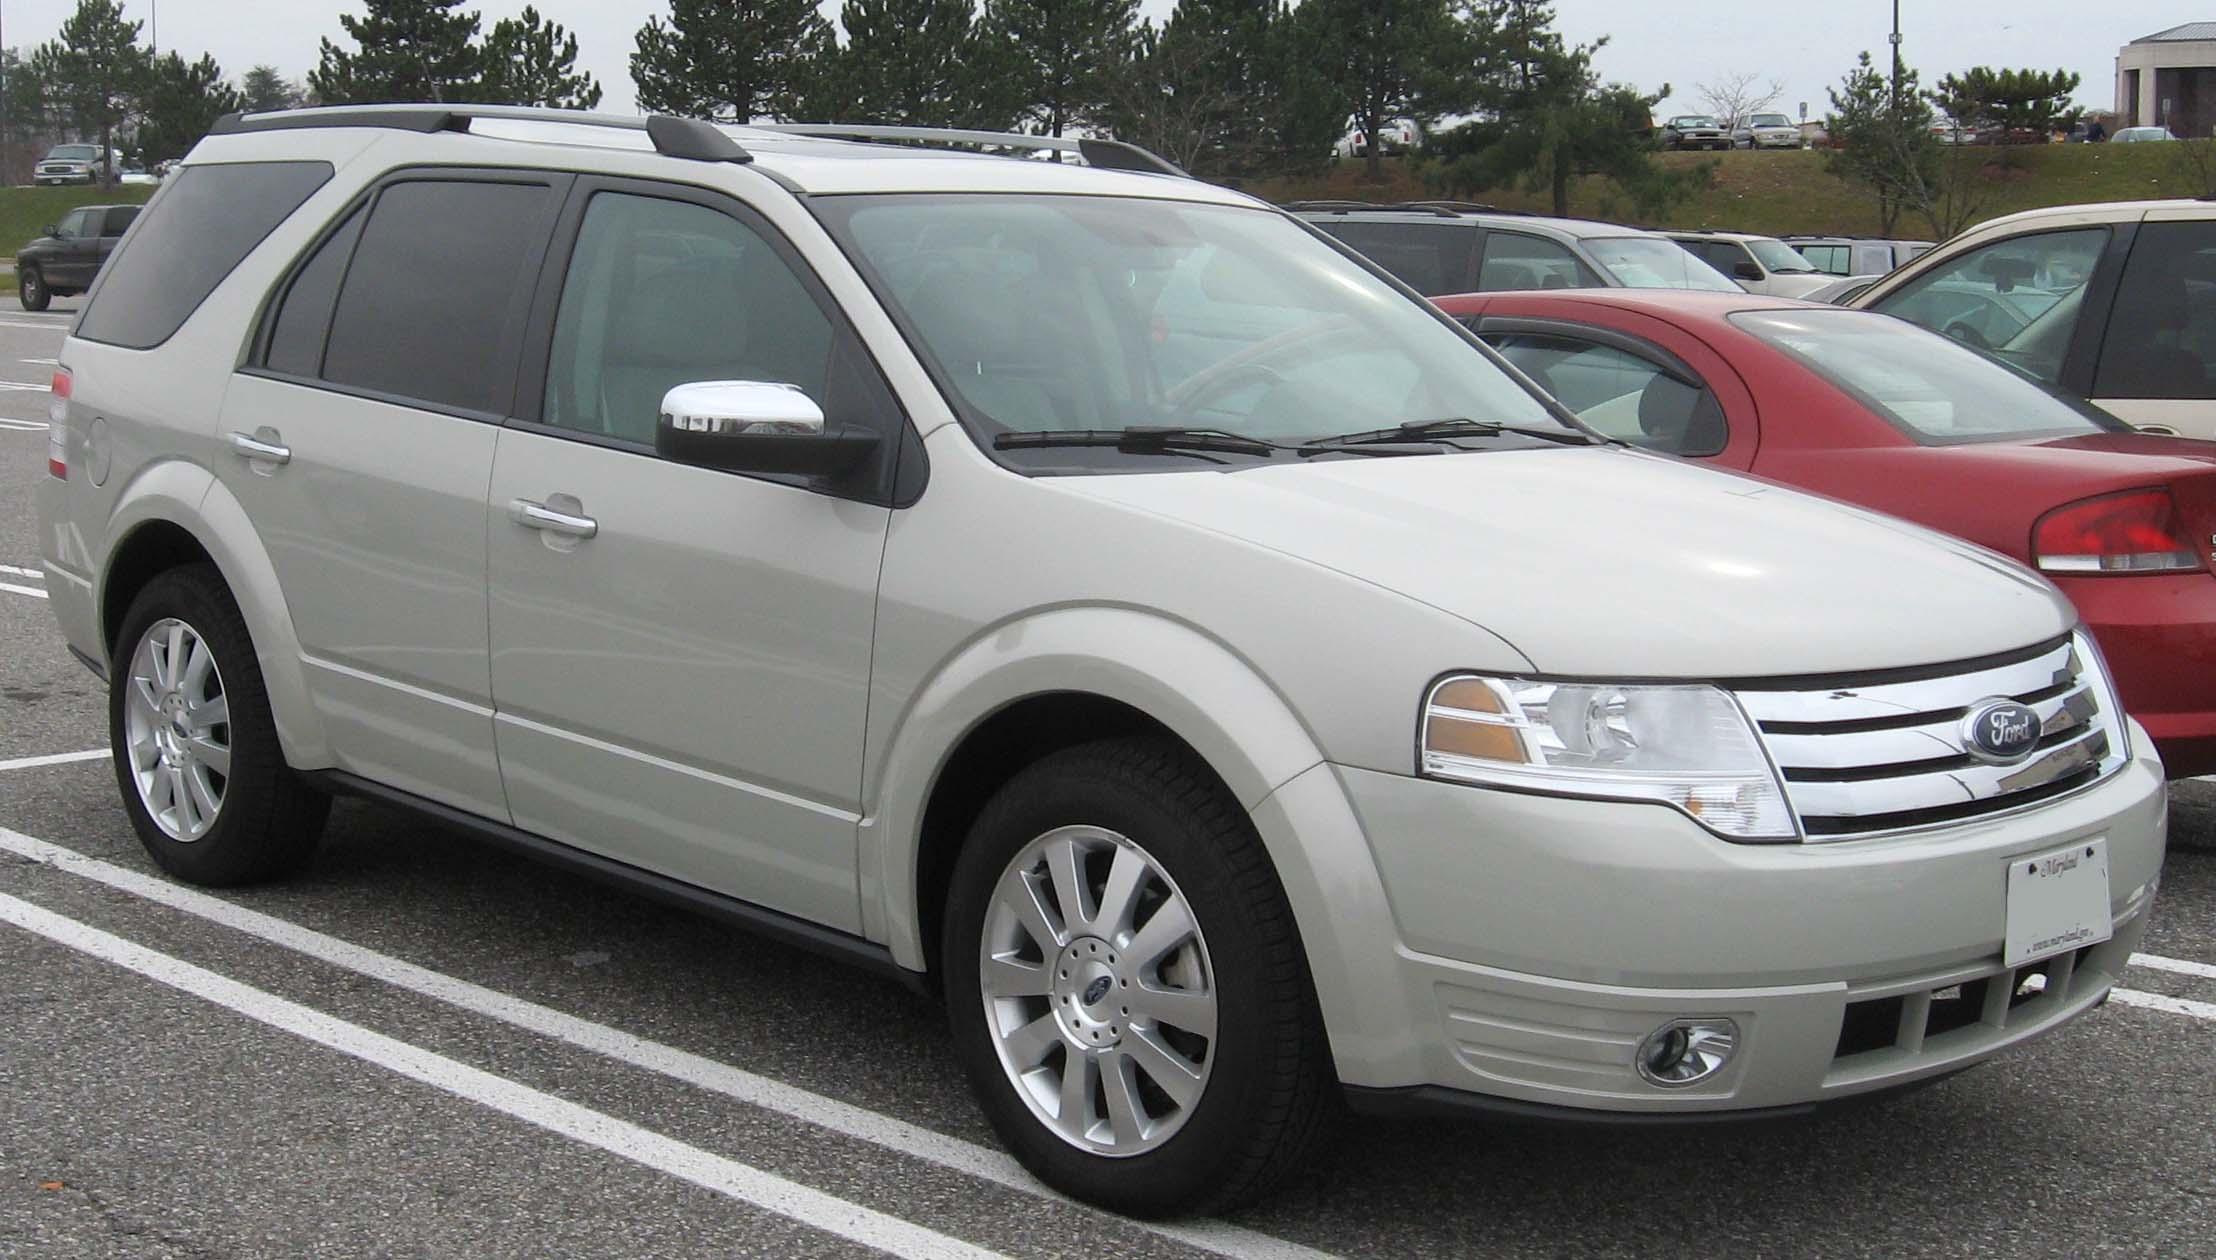 Ford Taurus X Limited SUV